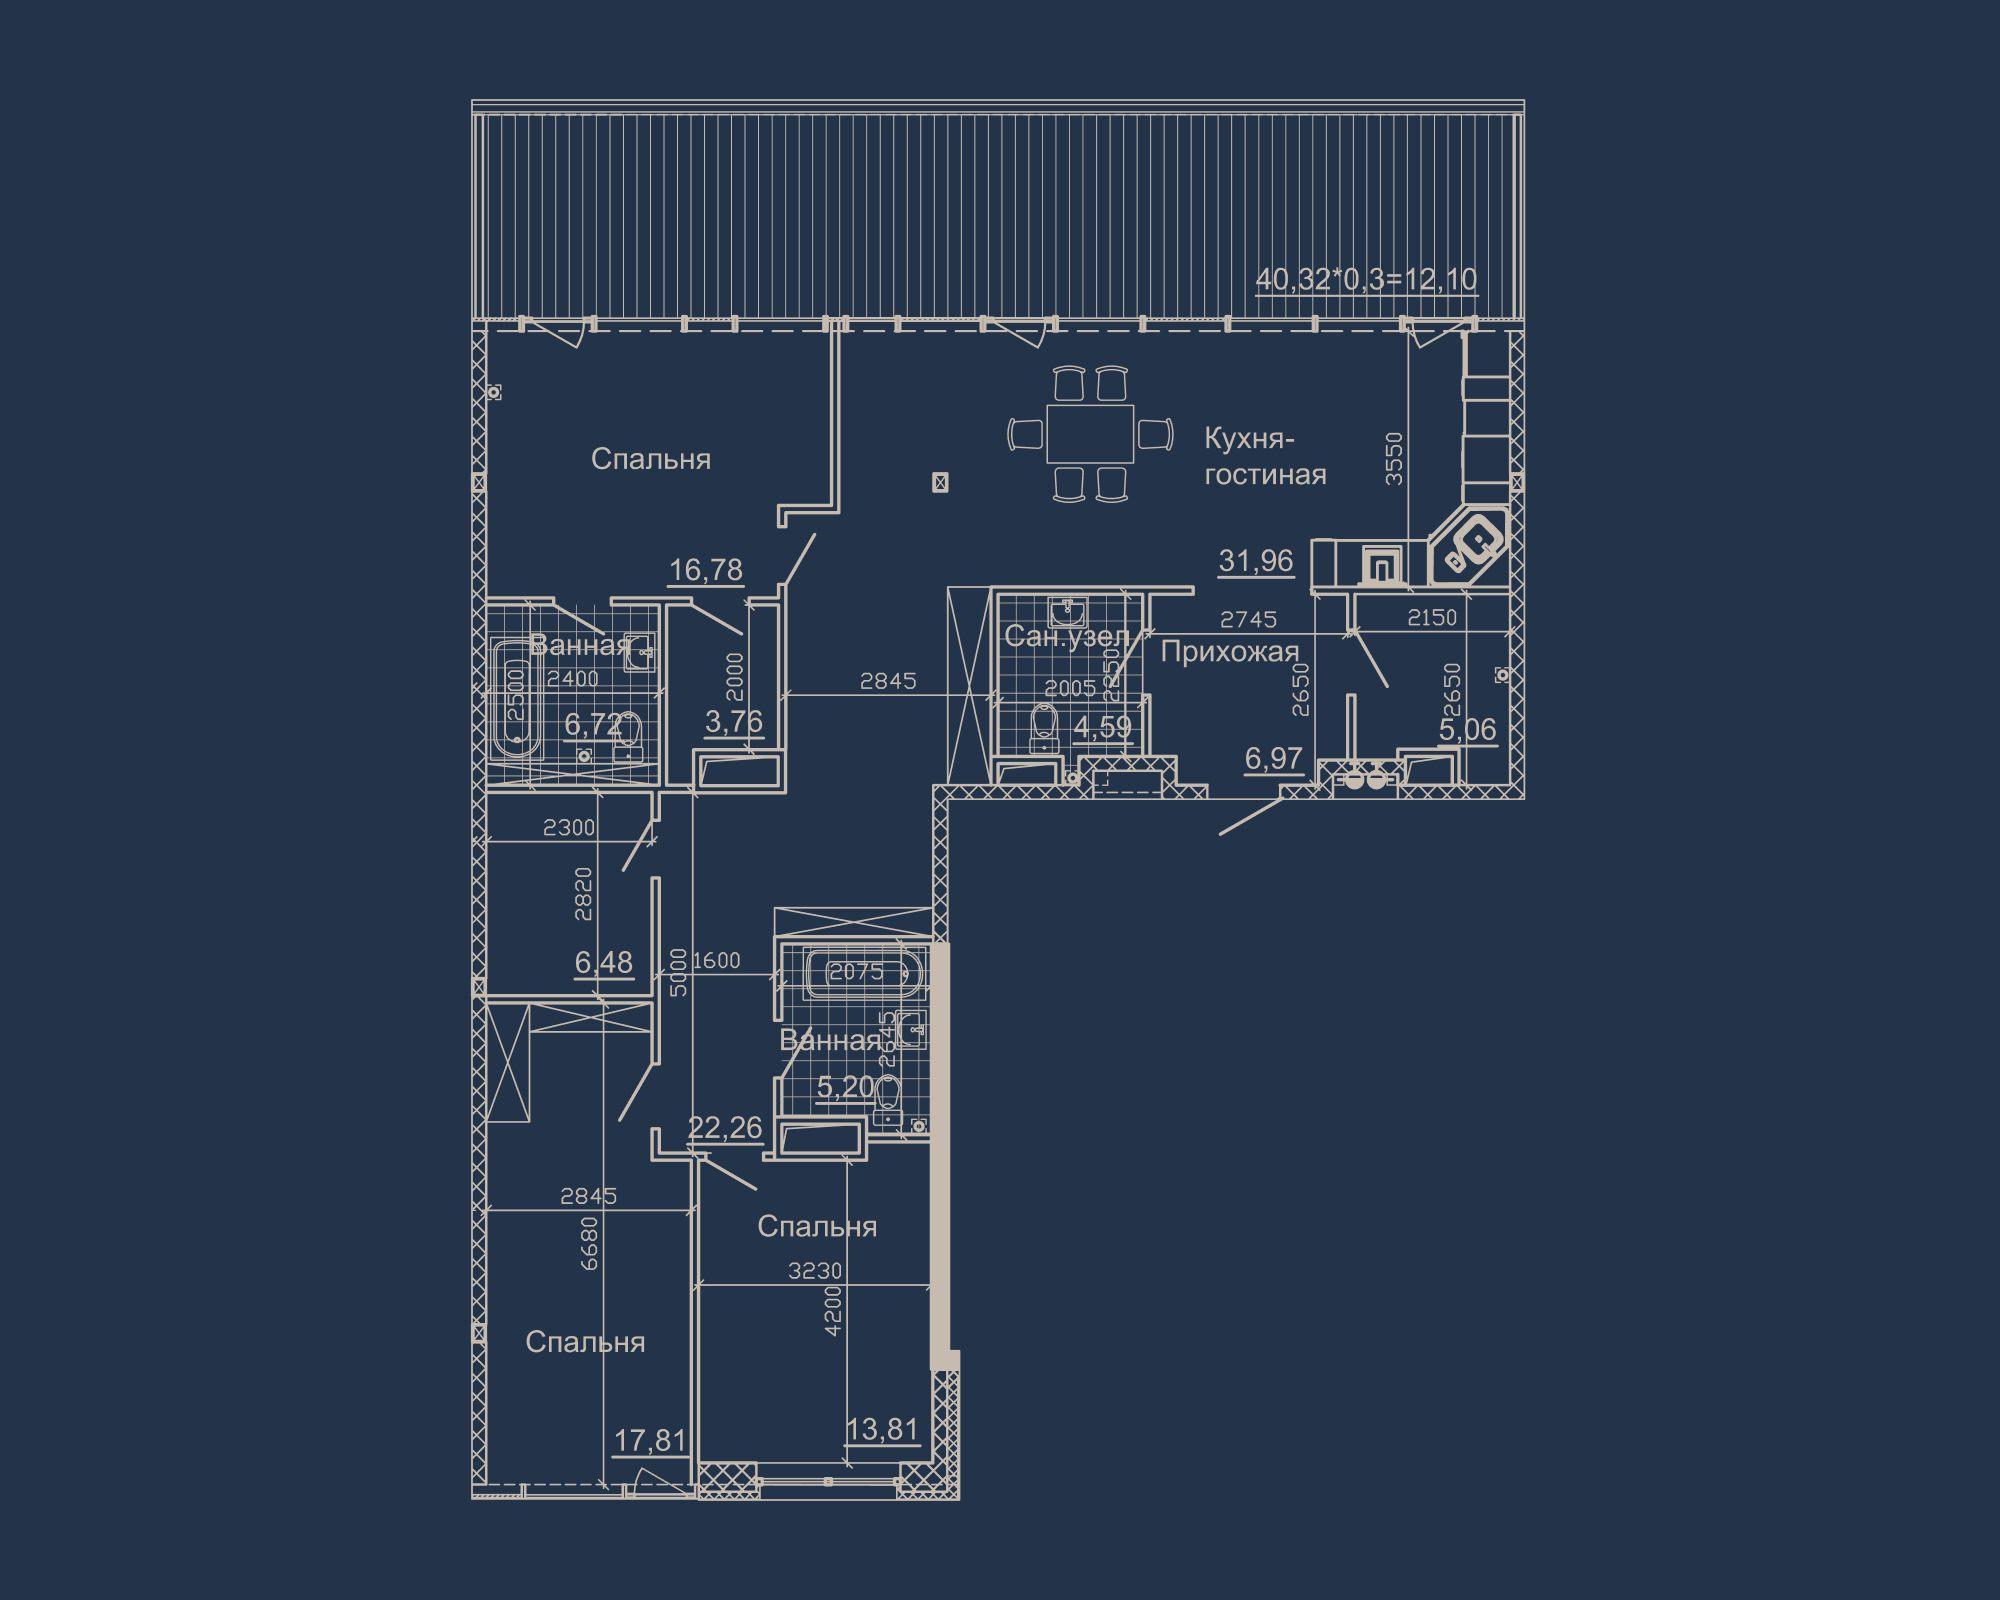 3-кімнатна квартира типу 18А-2 у ЖК Nebo